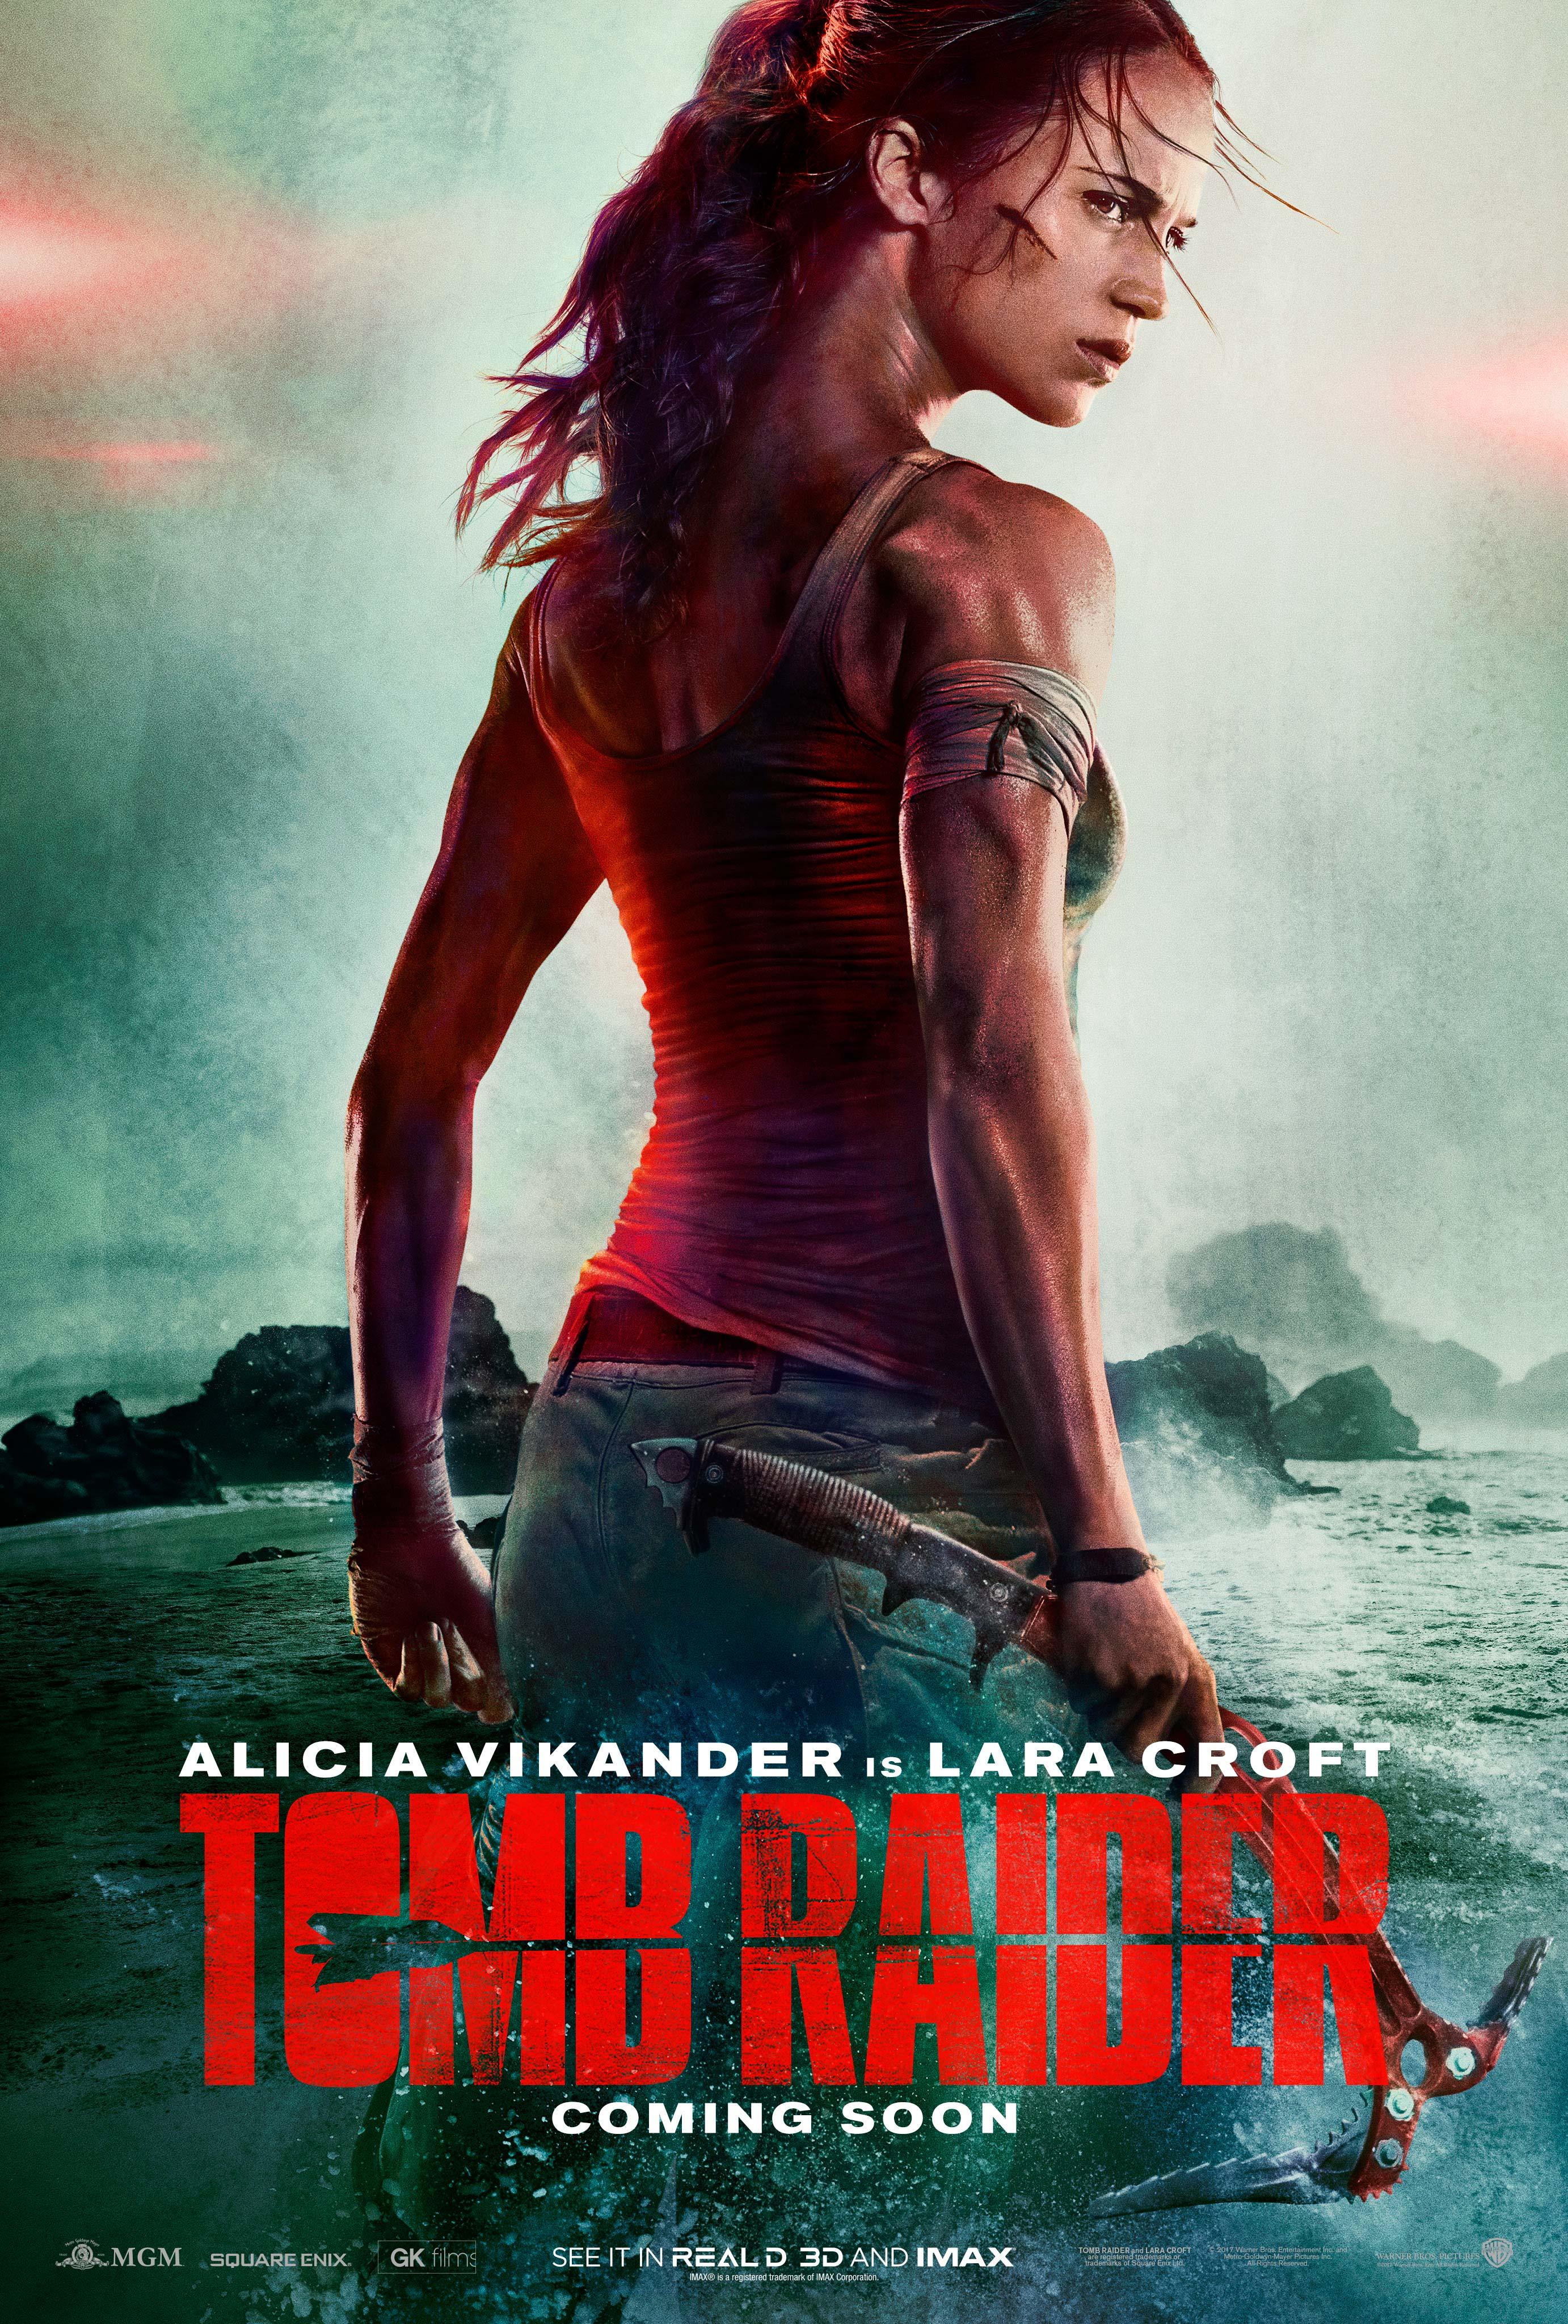 TR Teaser Poster - Dom - TWITTER (2764x4096)